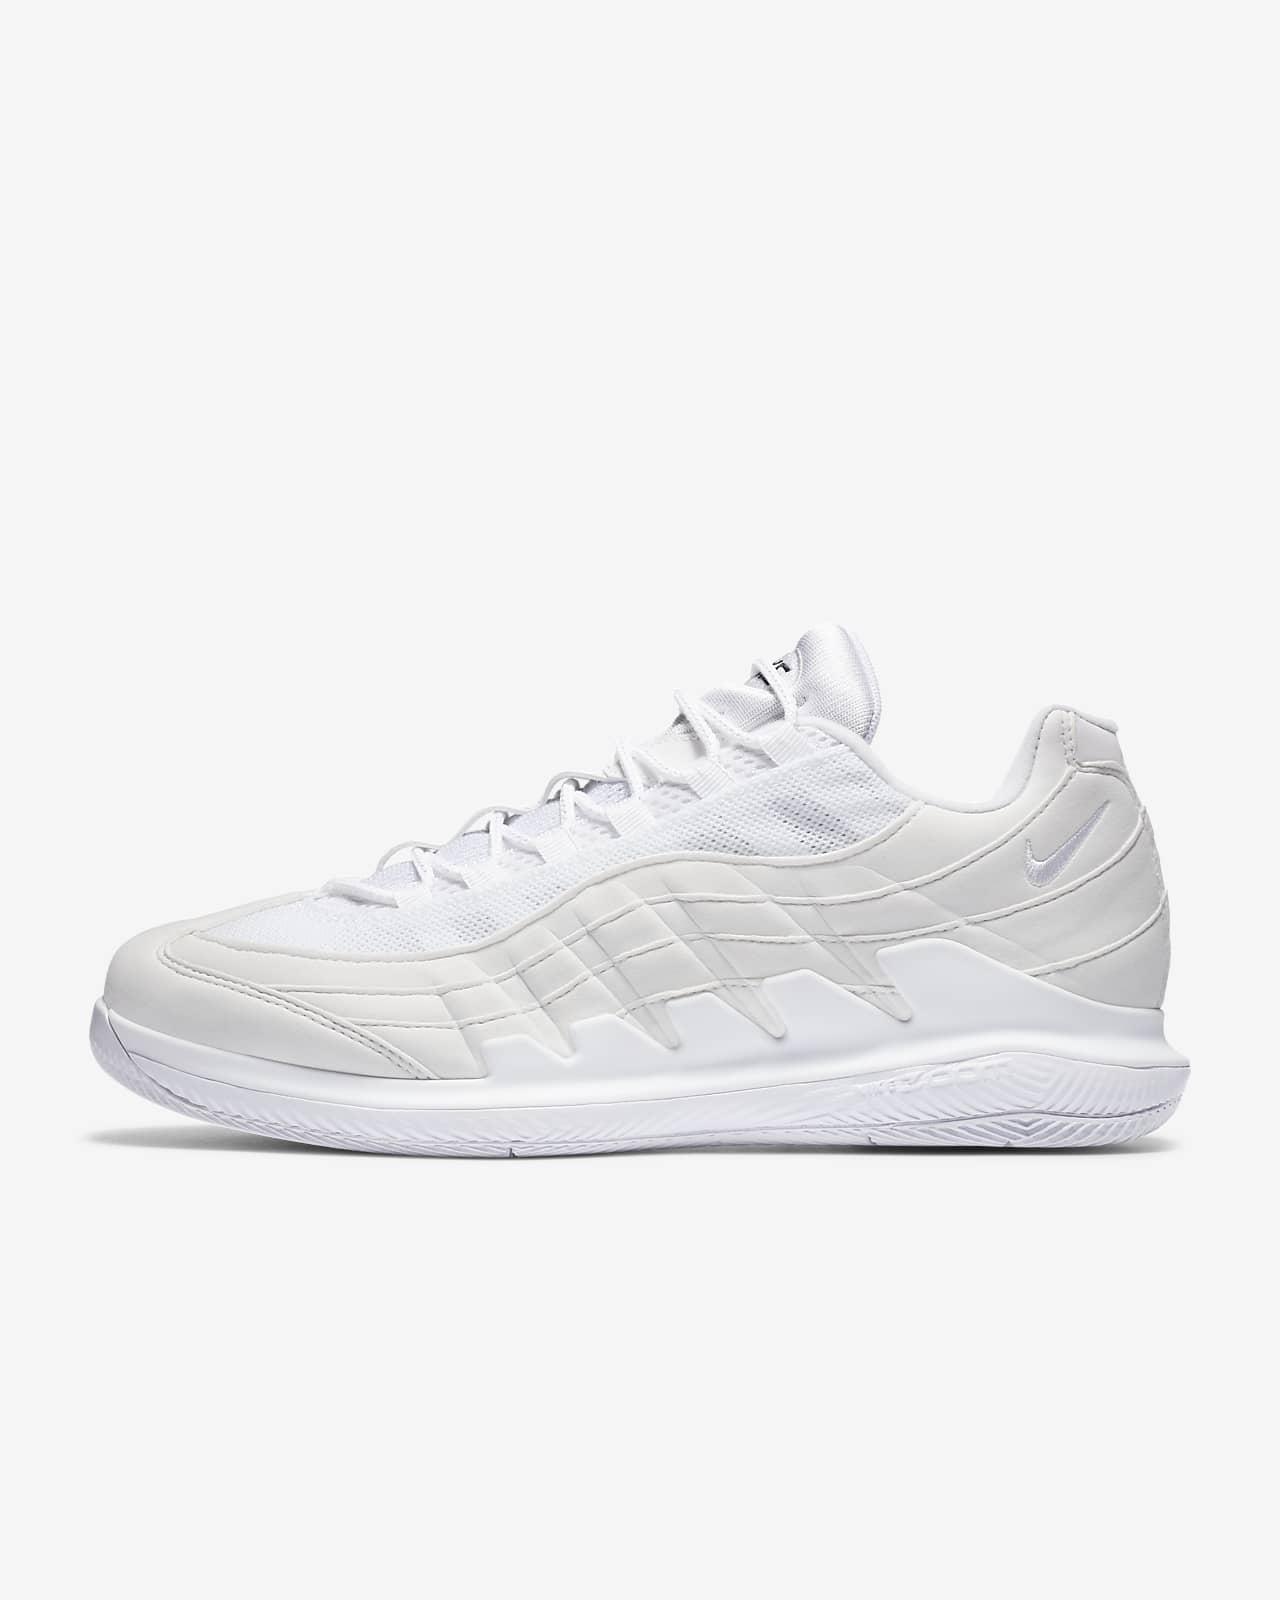 NikeCourt Zoom Vapor X Air Max 95 Men's Tennis Shoe